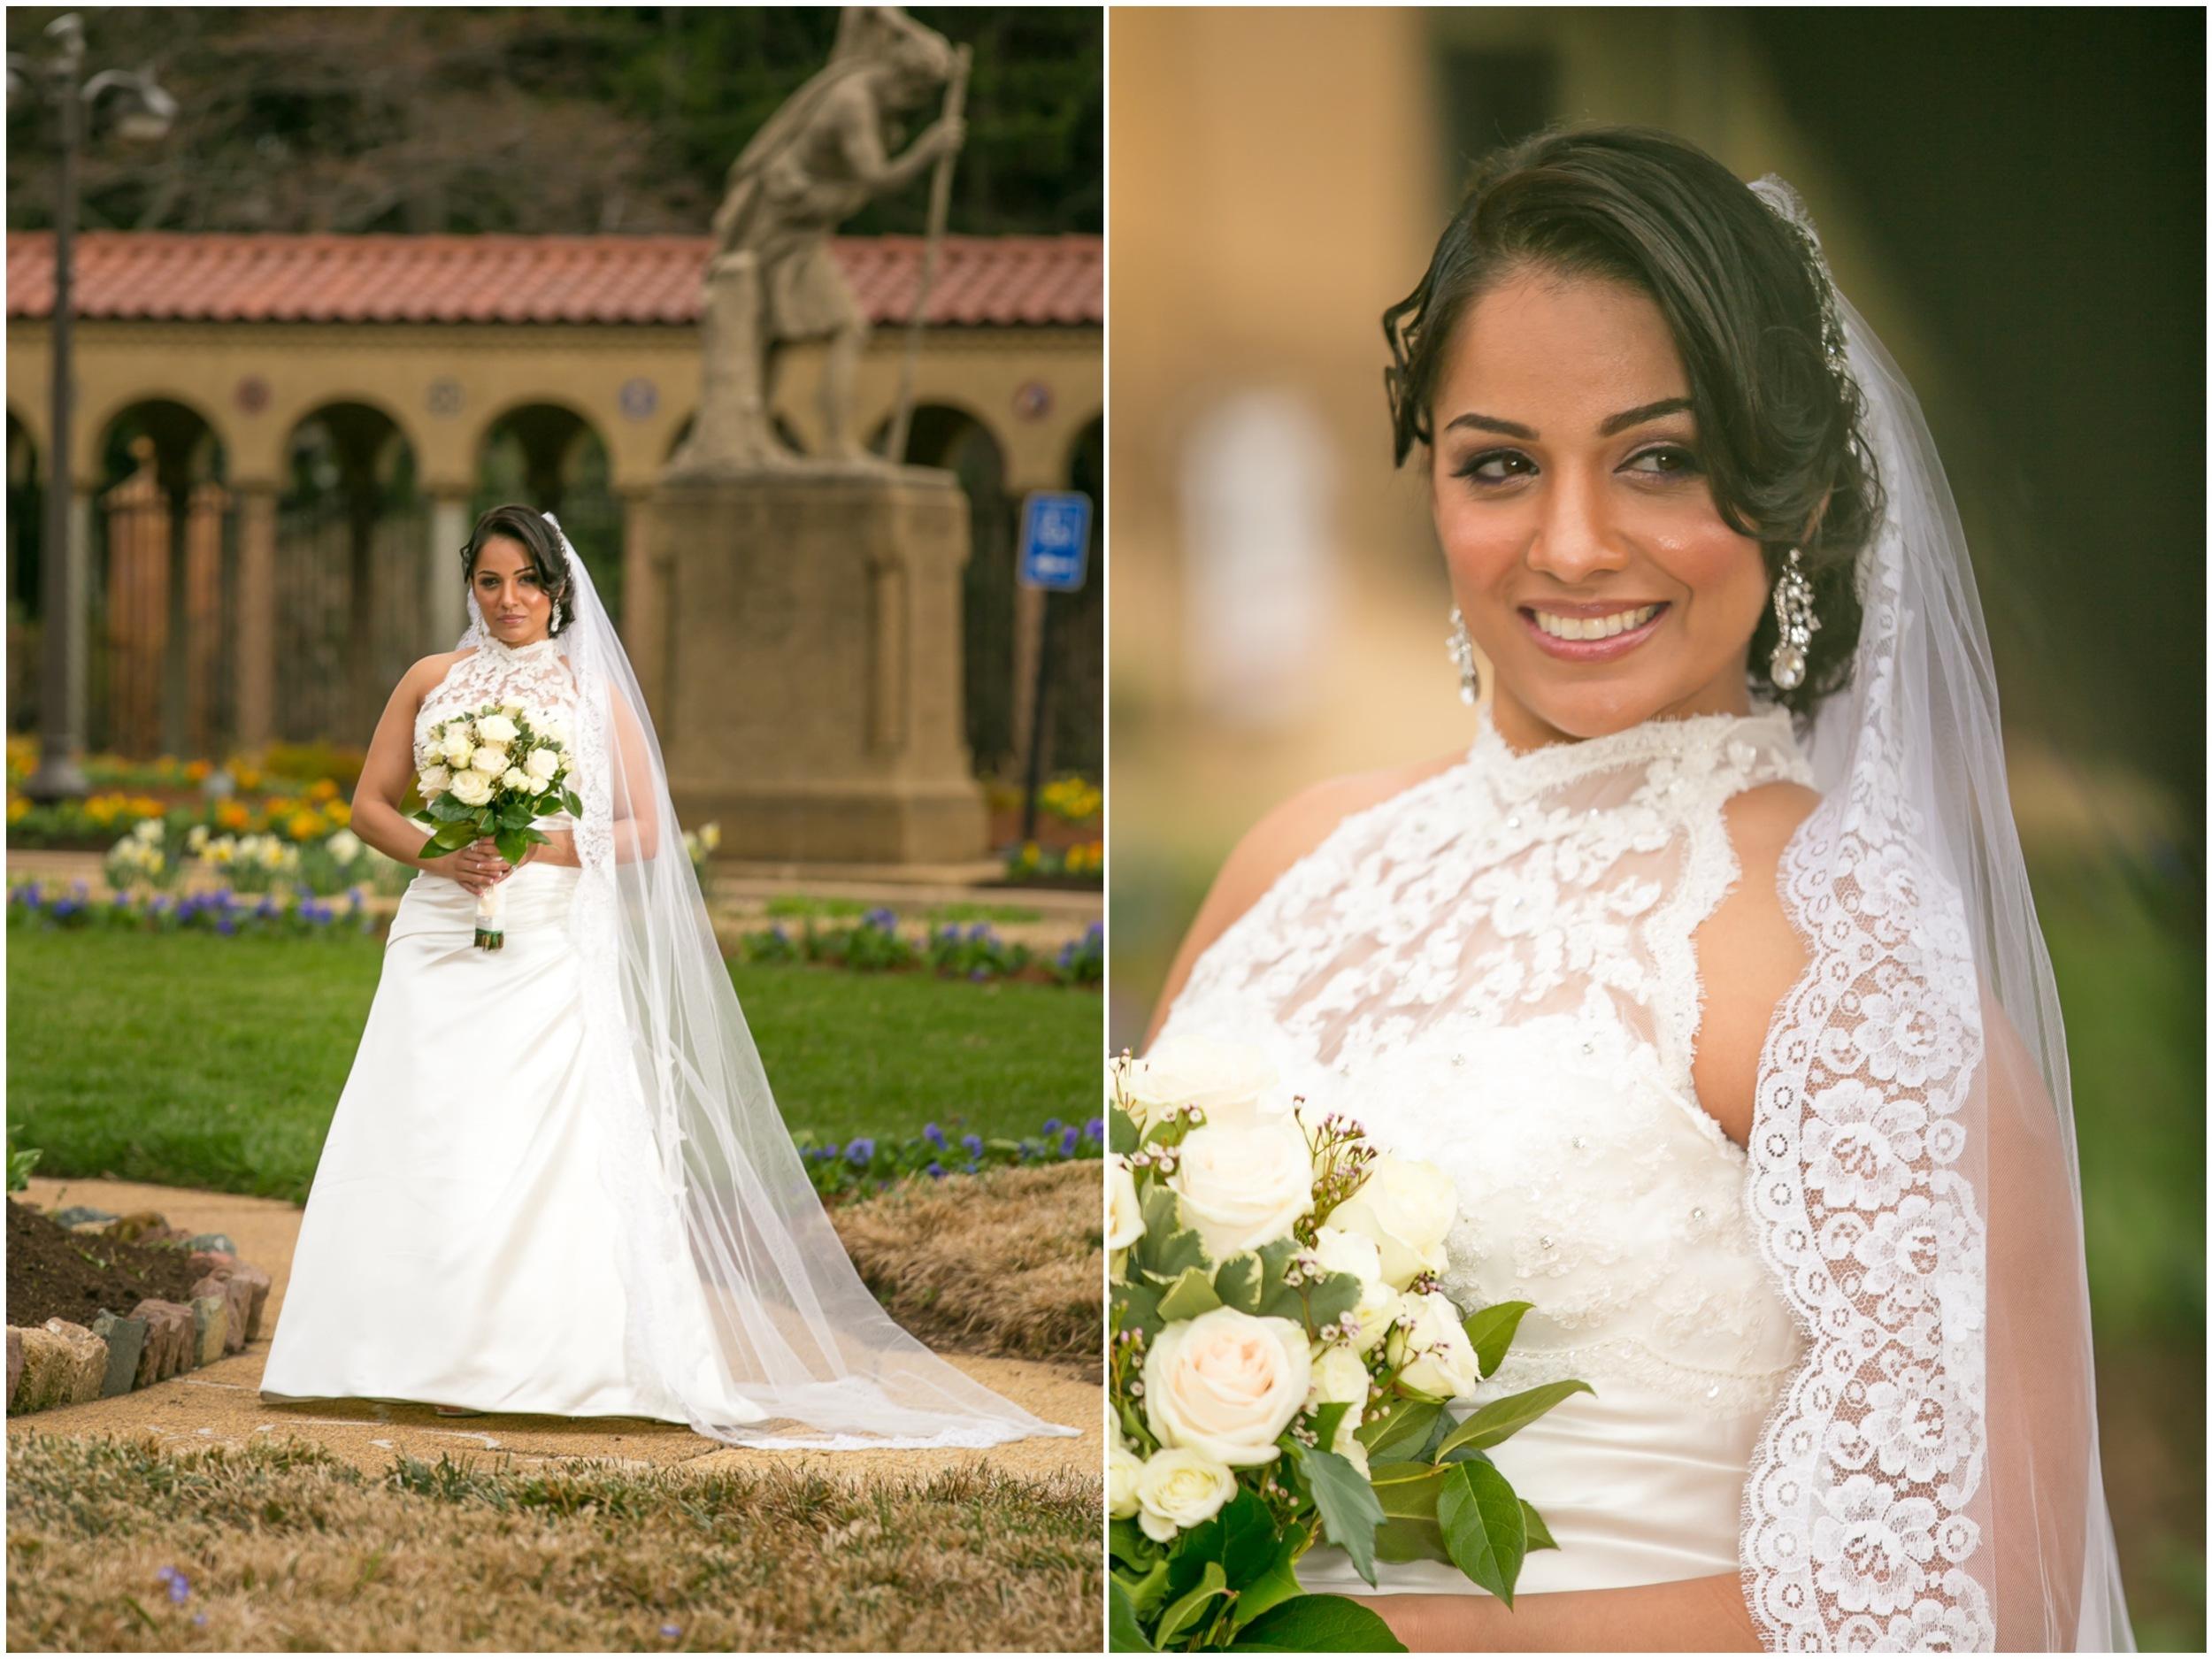 Bradly-and-Jesenia-Wedding-Collage-25.jpg